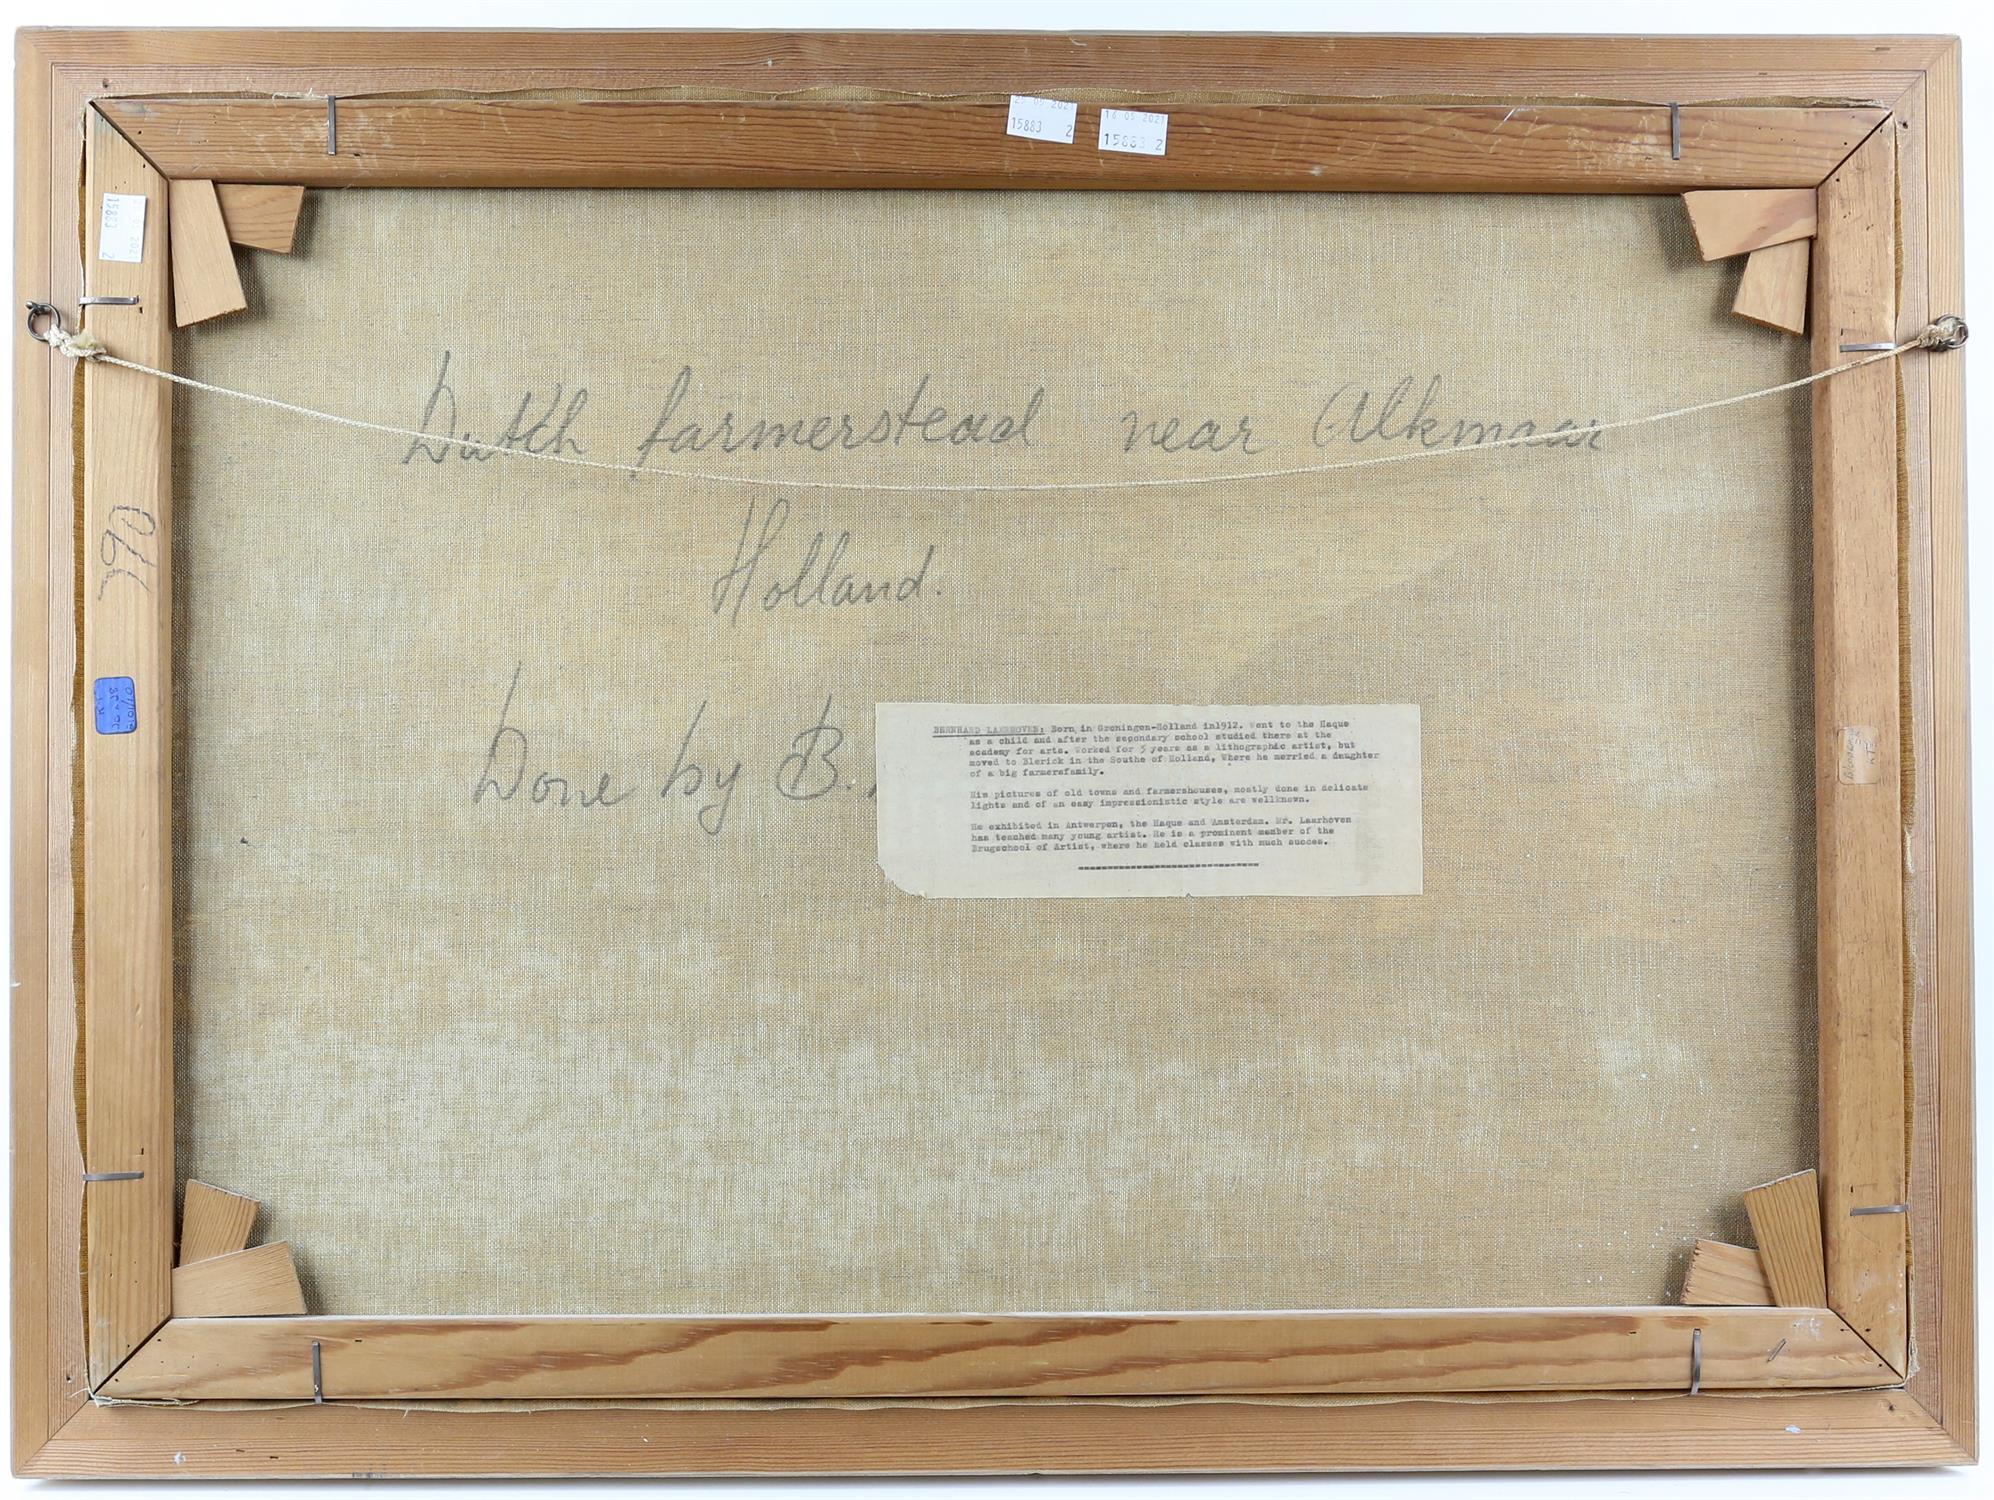 Bernard Laarhoven (Dutch, 1912). Dutch farmstead near Alkmar, Holland , title to verso, - Image 4 of 4